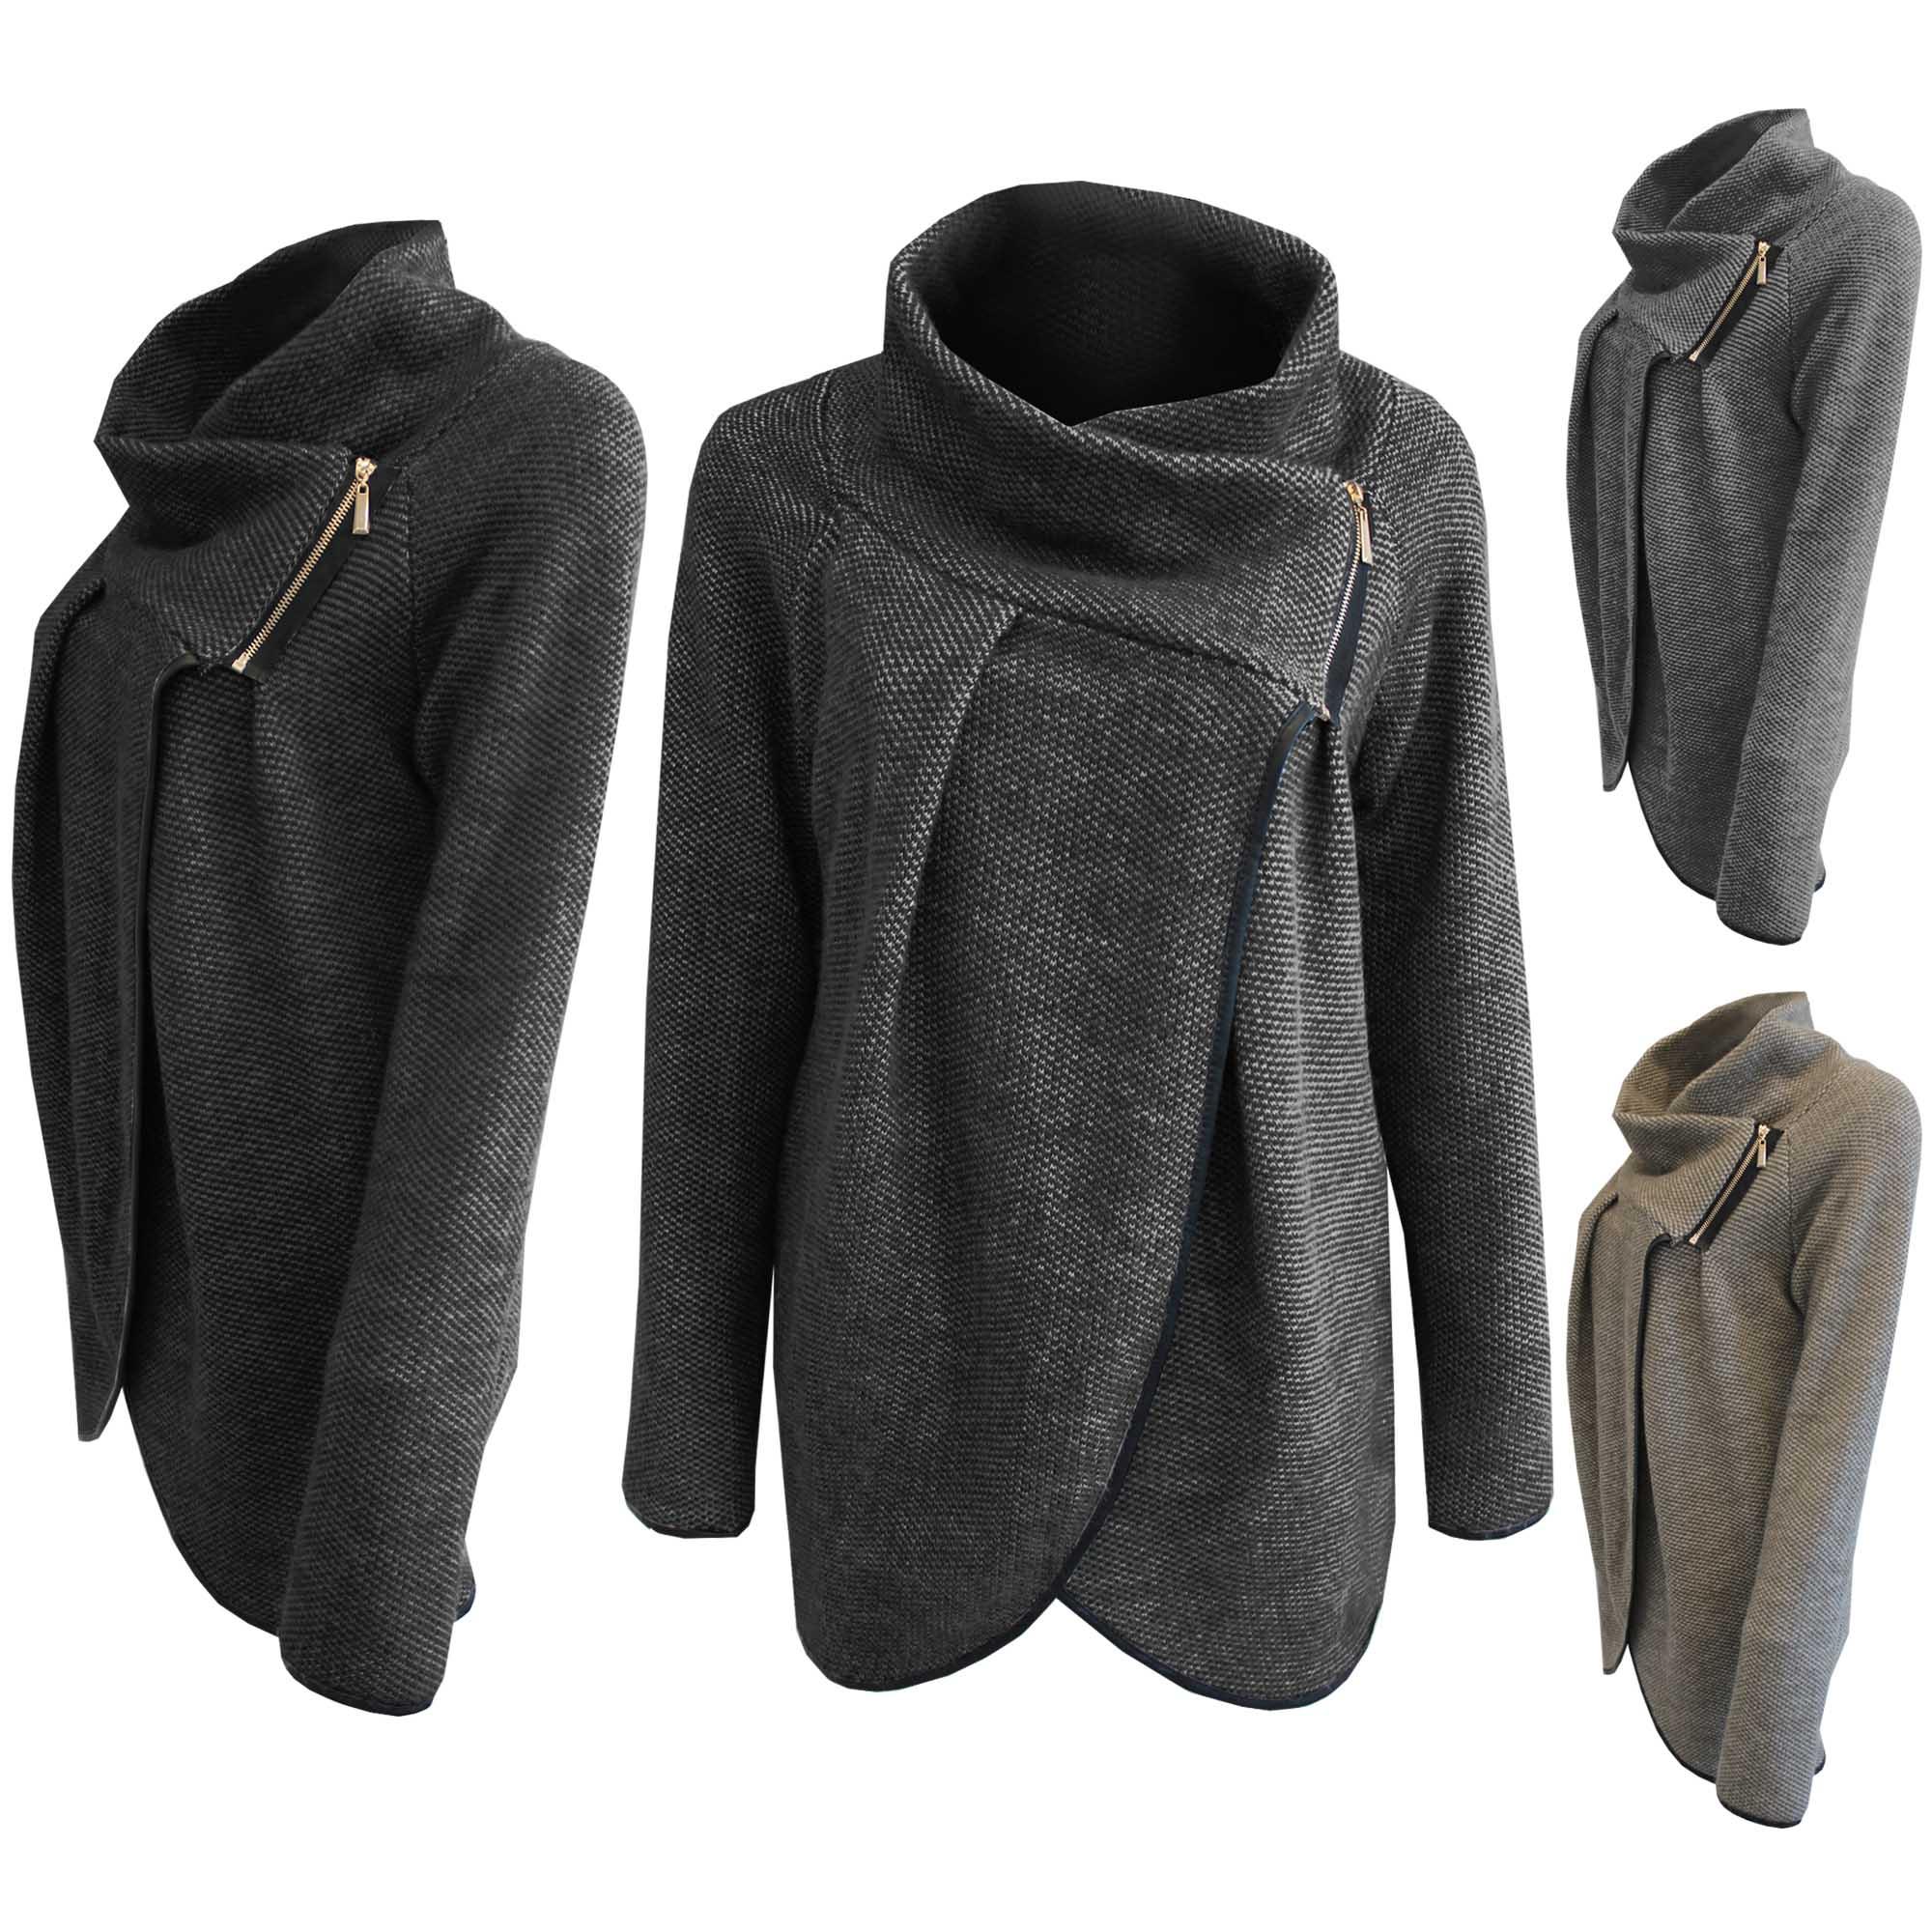 Knitting Cardigan Collar : Womens marl knit cardigan drape zip collar cape ladies